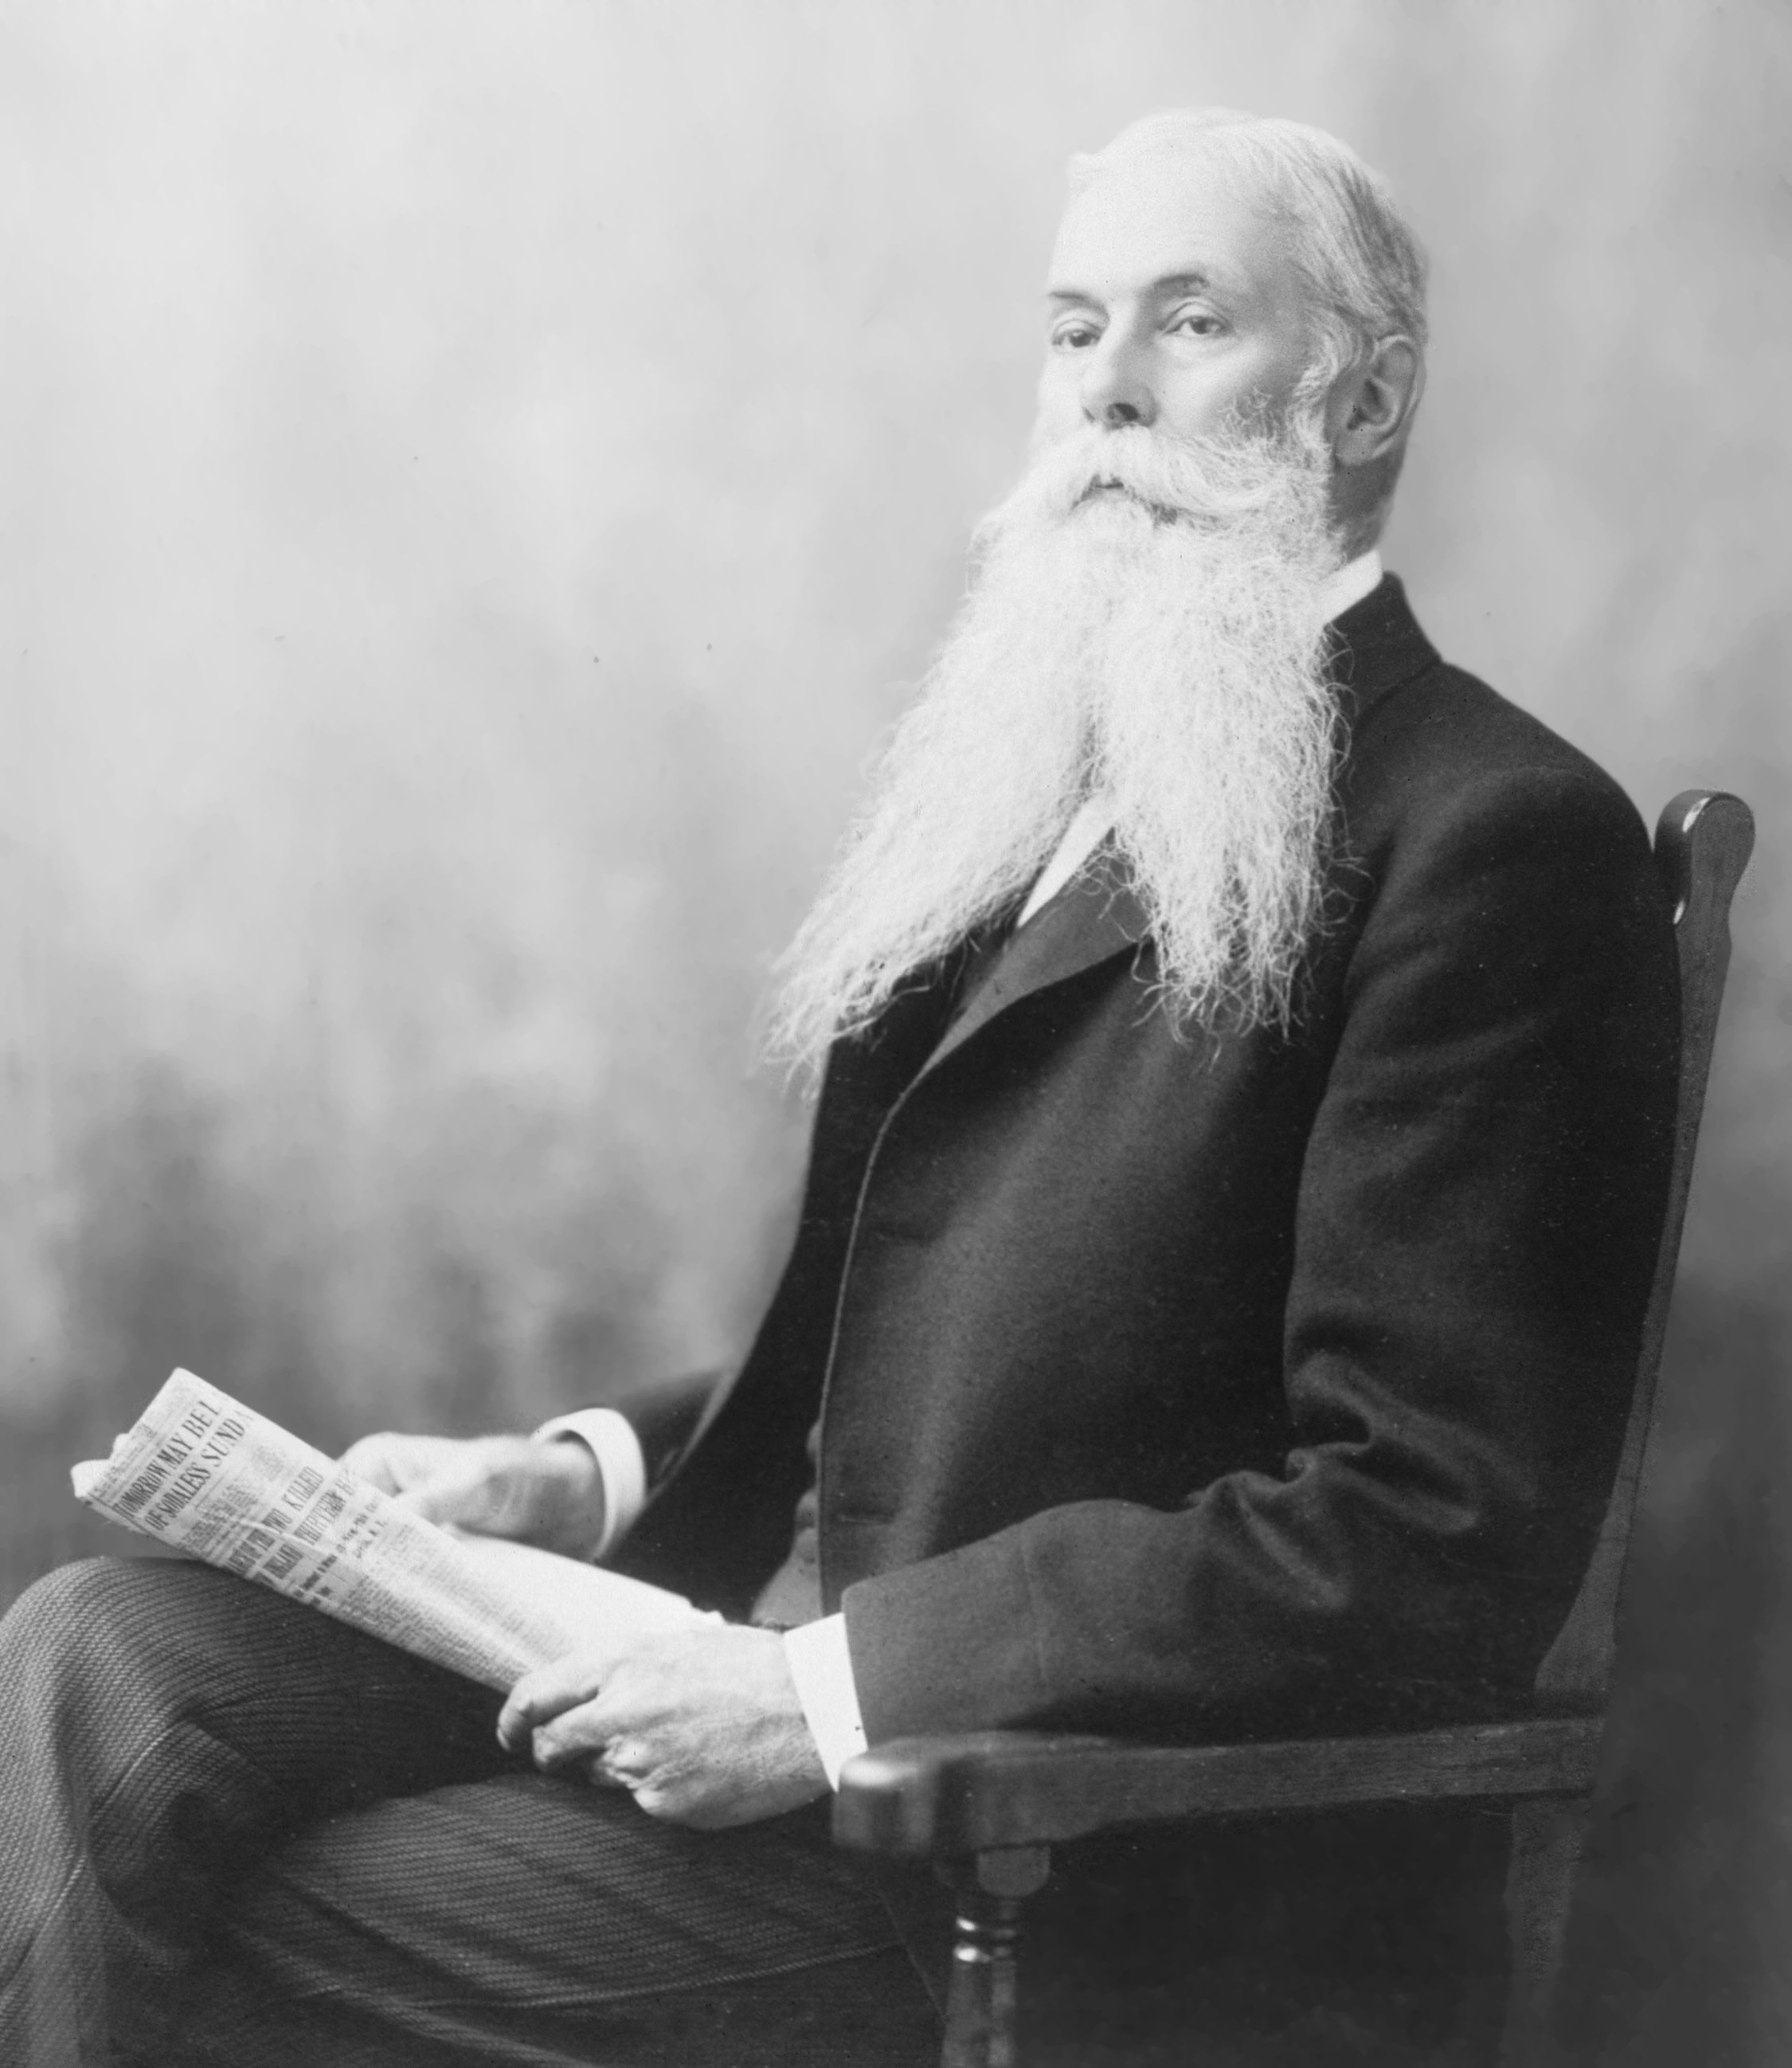 Sanford B. Dole holding a newspaper.